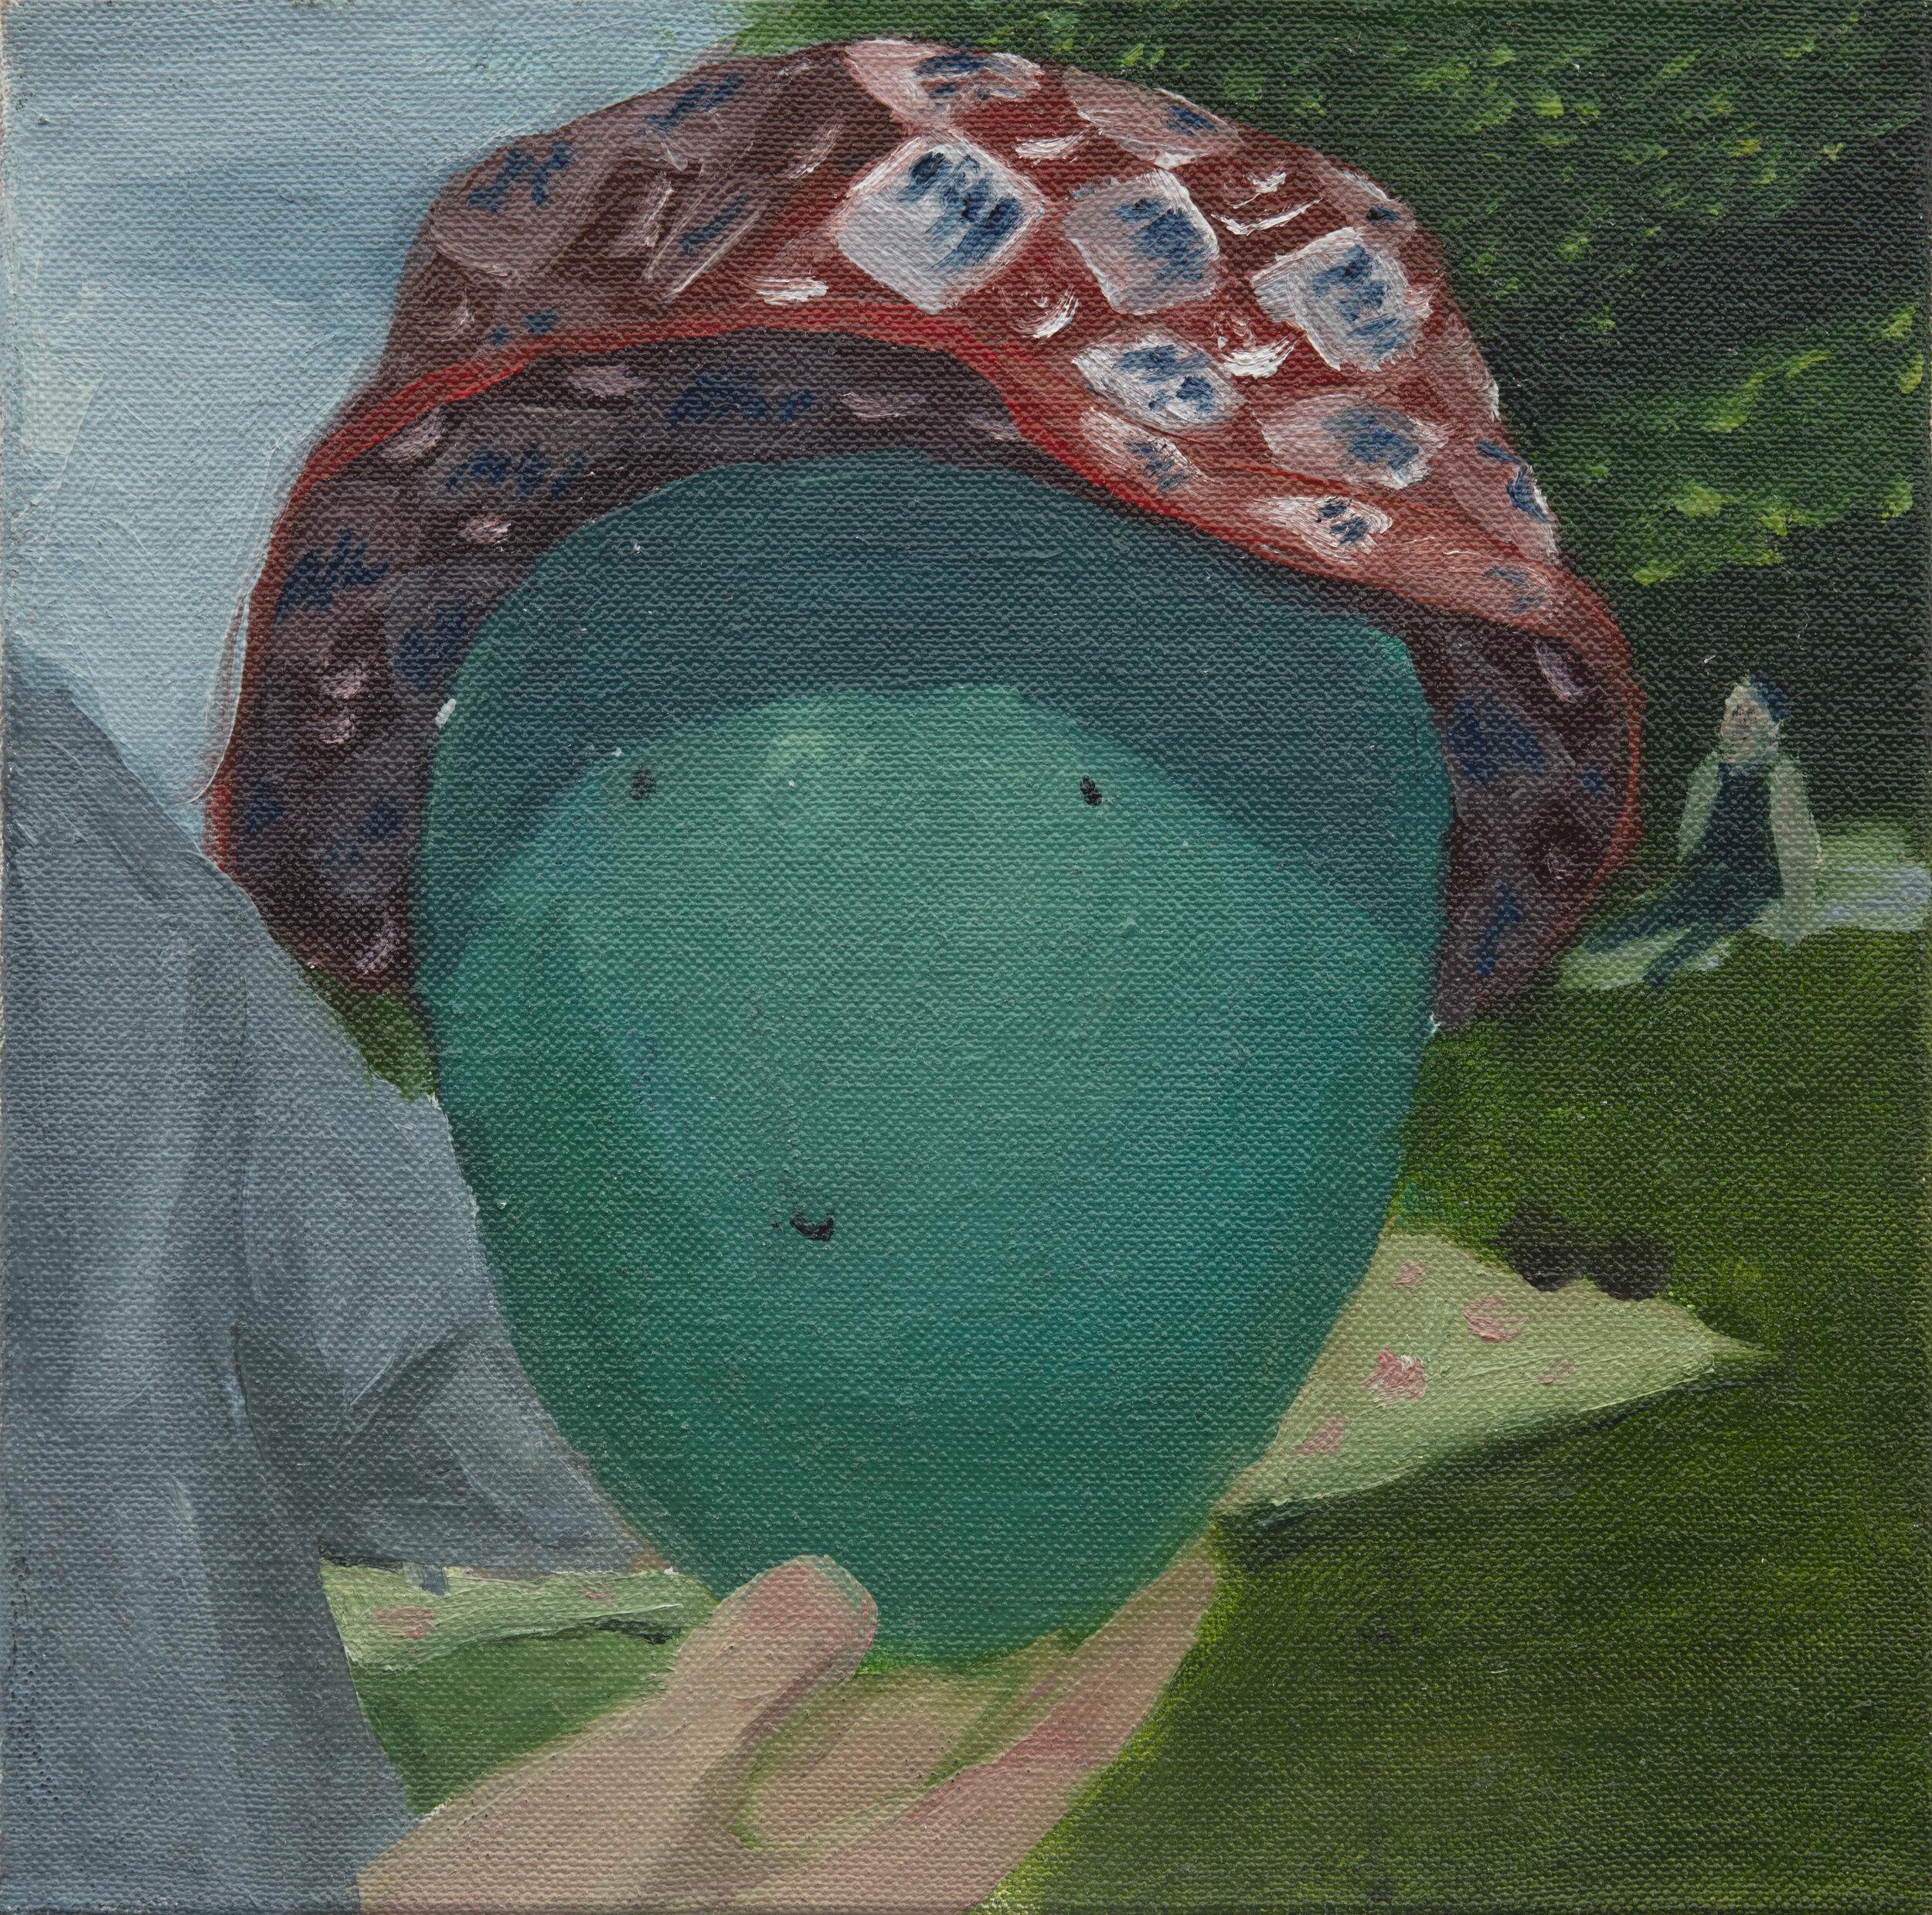 30 x 30 cm  oil on canvas